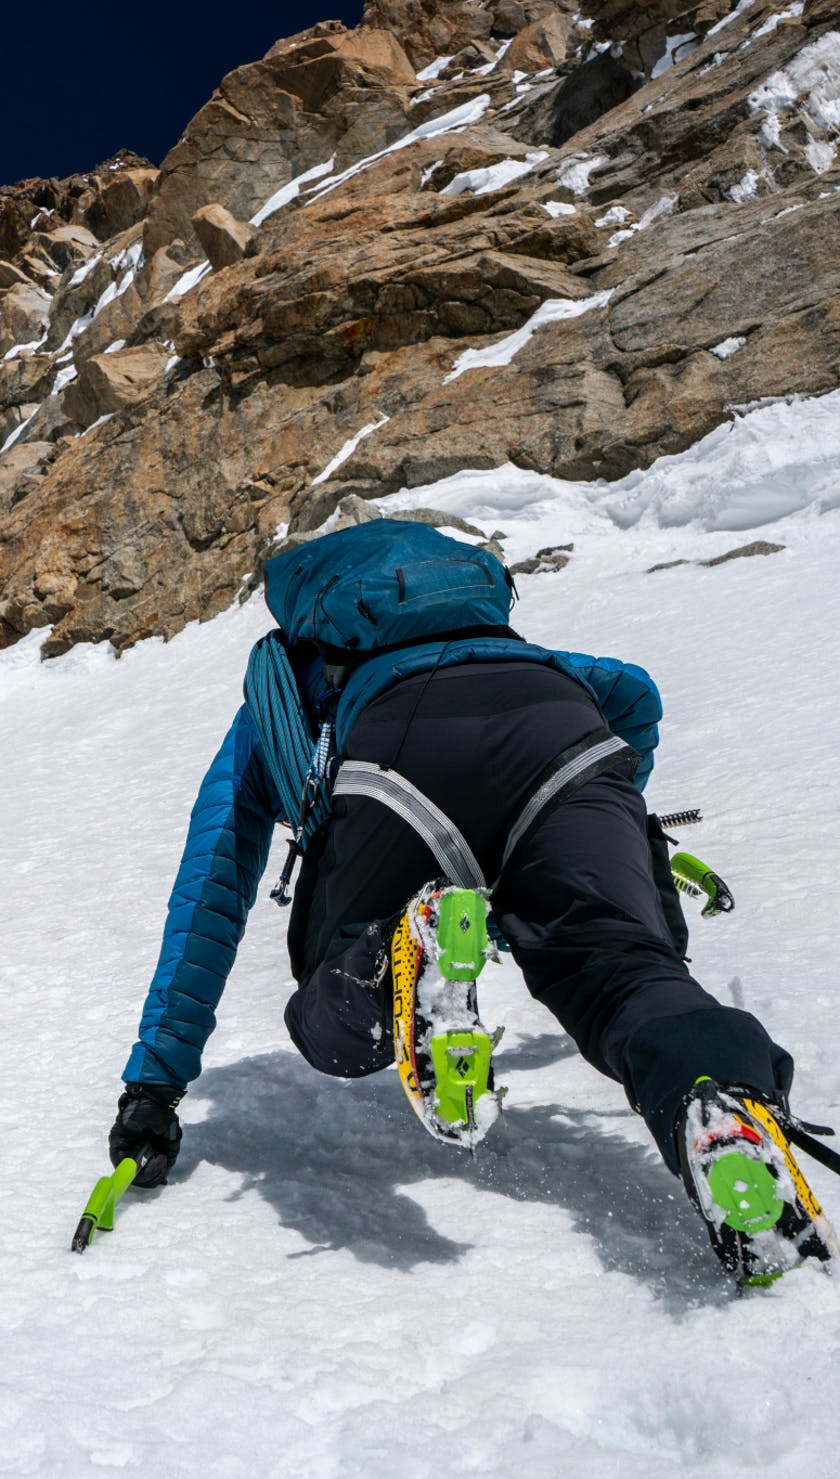 Black Diamond EU Ambassador Korra soloing Hyper Couloir on Mont Blanc.